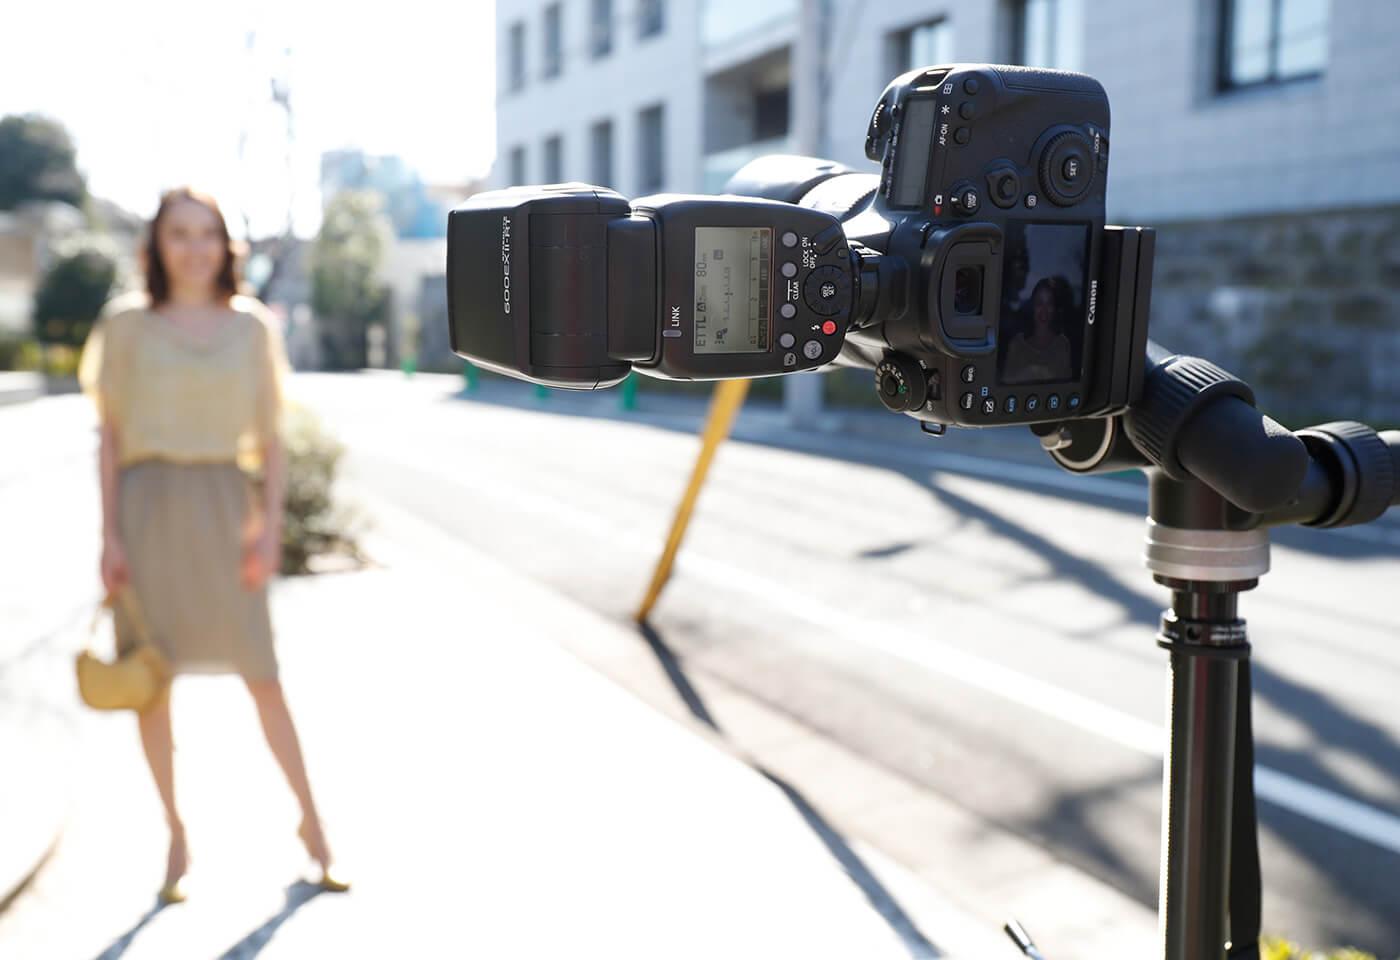 Girl taken with Canon Speedlite 600EX II-RT flash